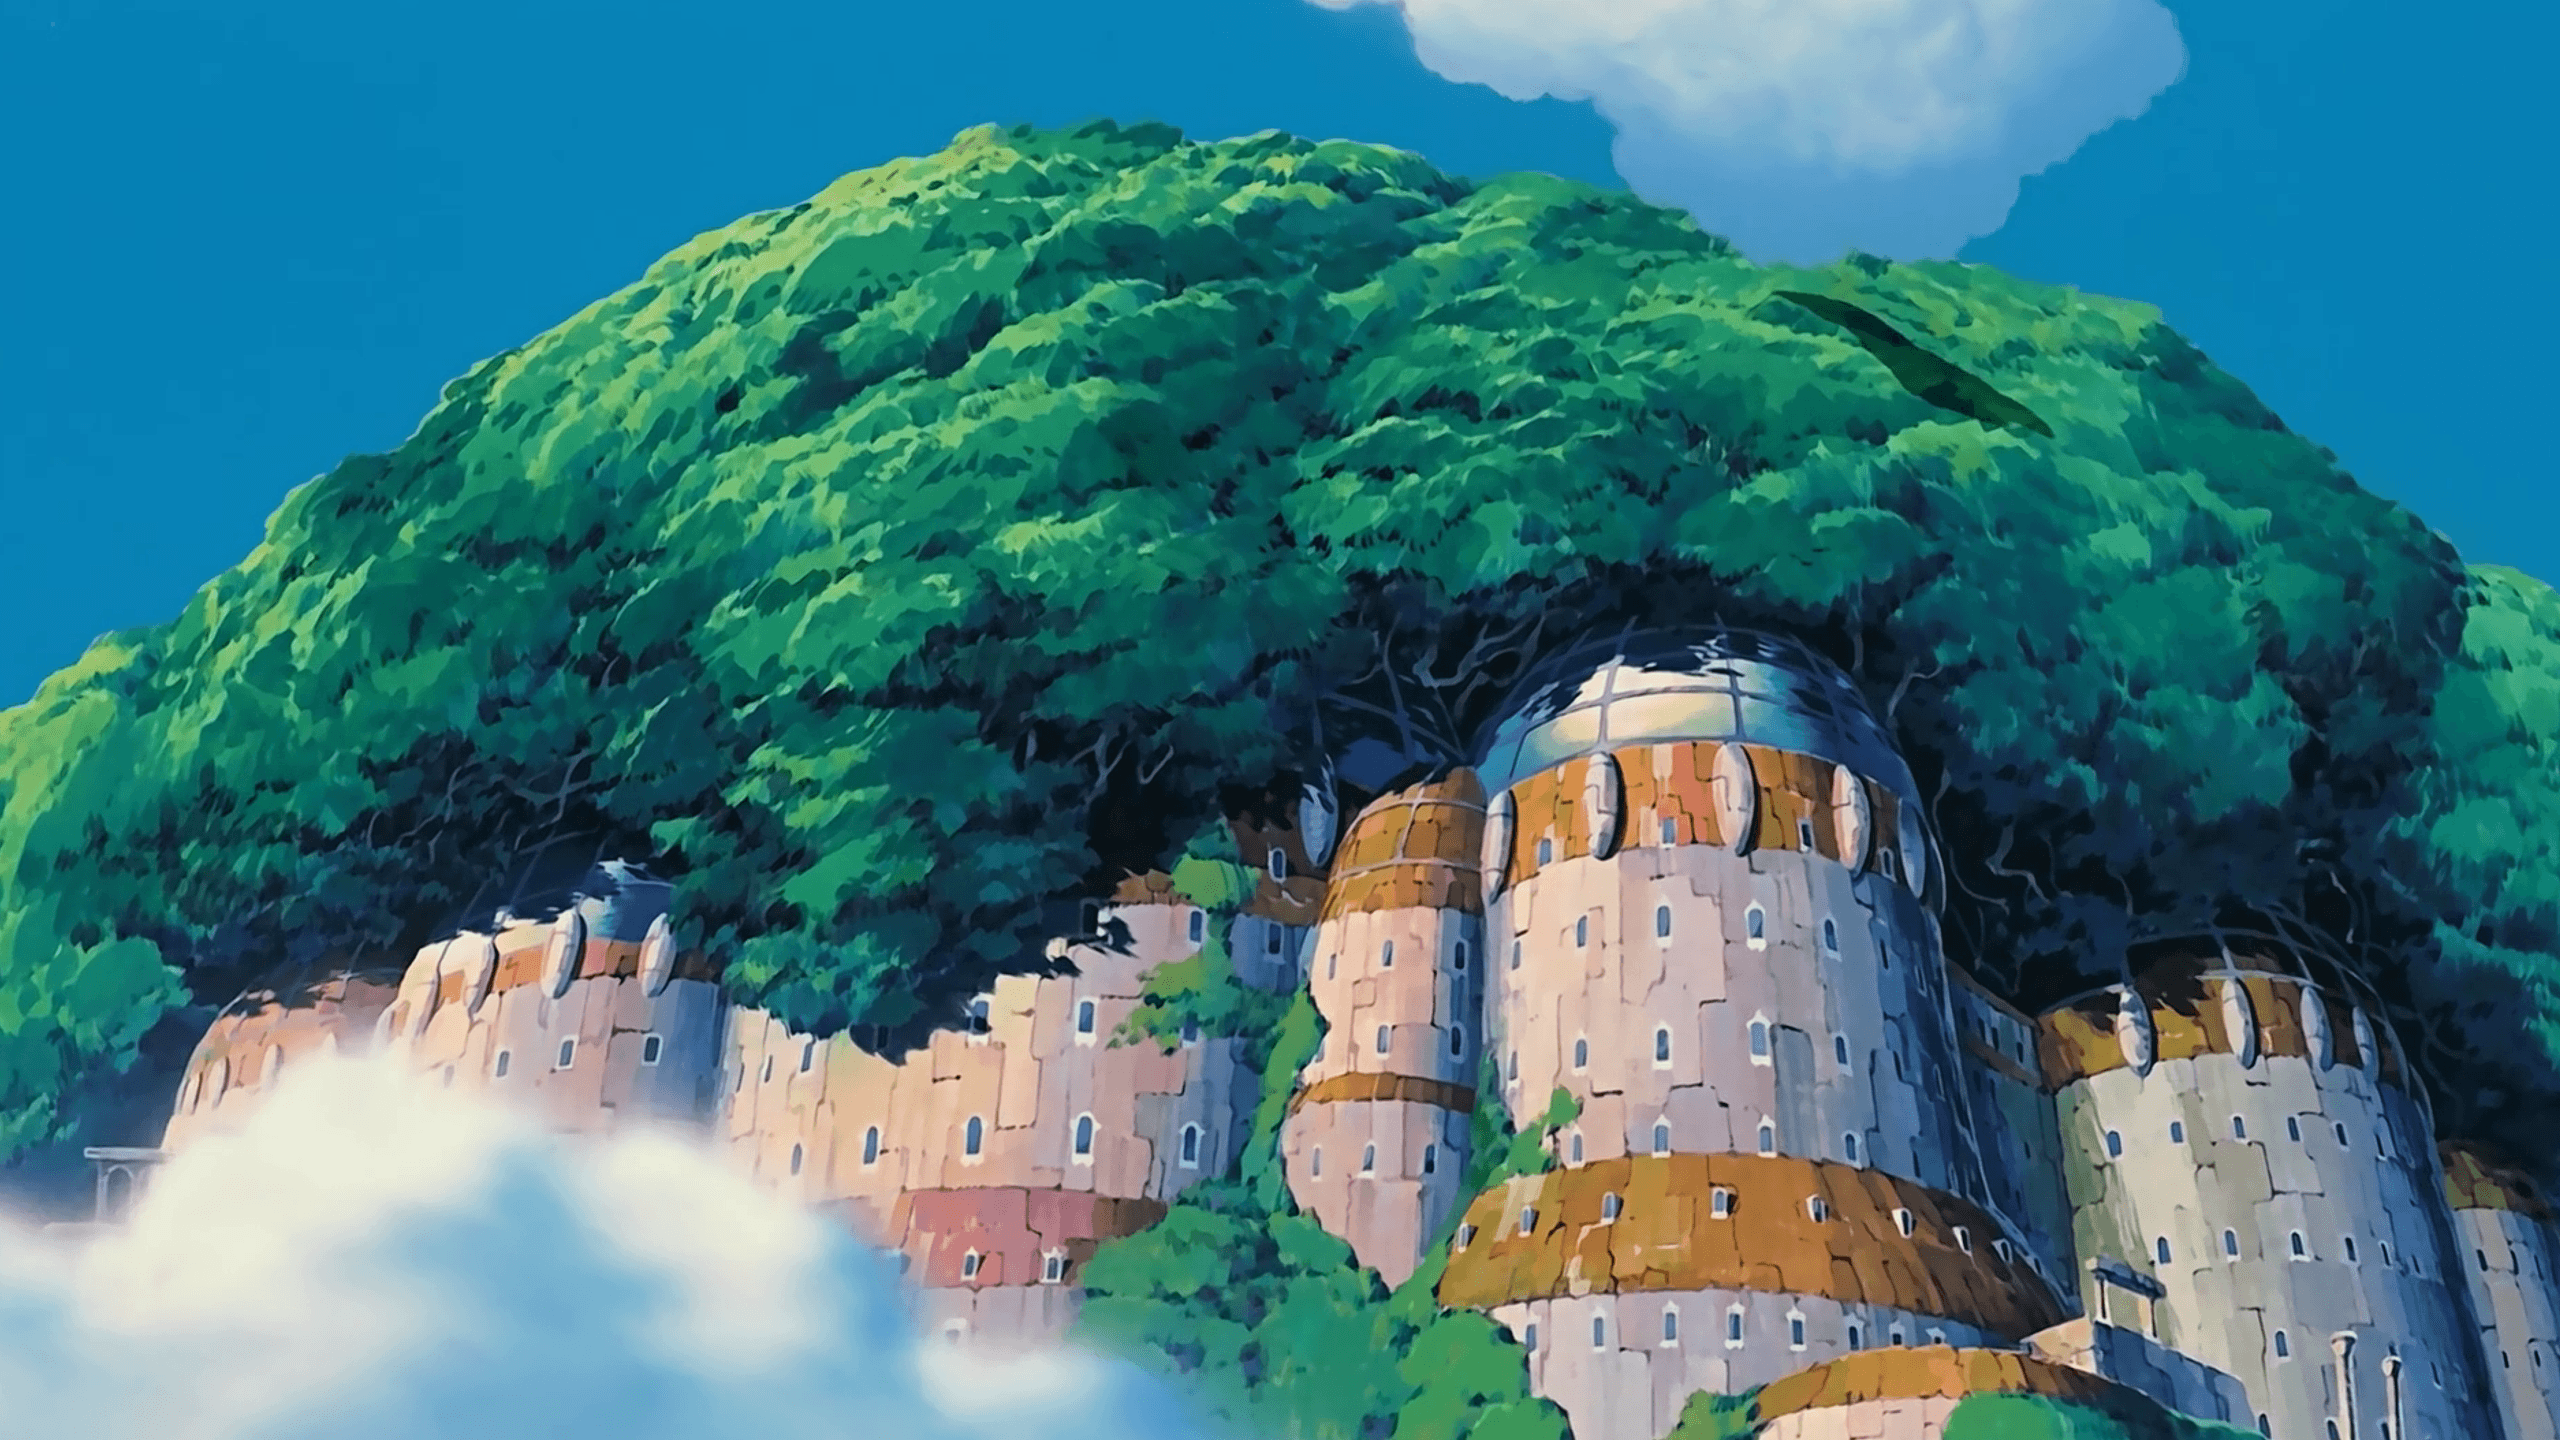 Studio Ghibli Laptop Wallpapers On Wallpaperdog